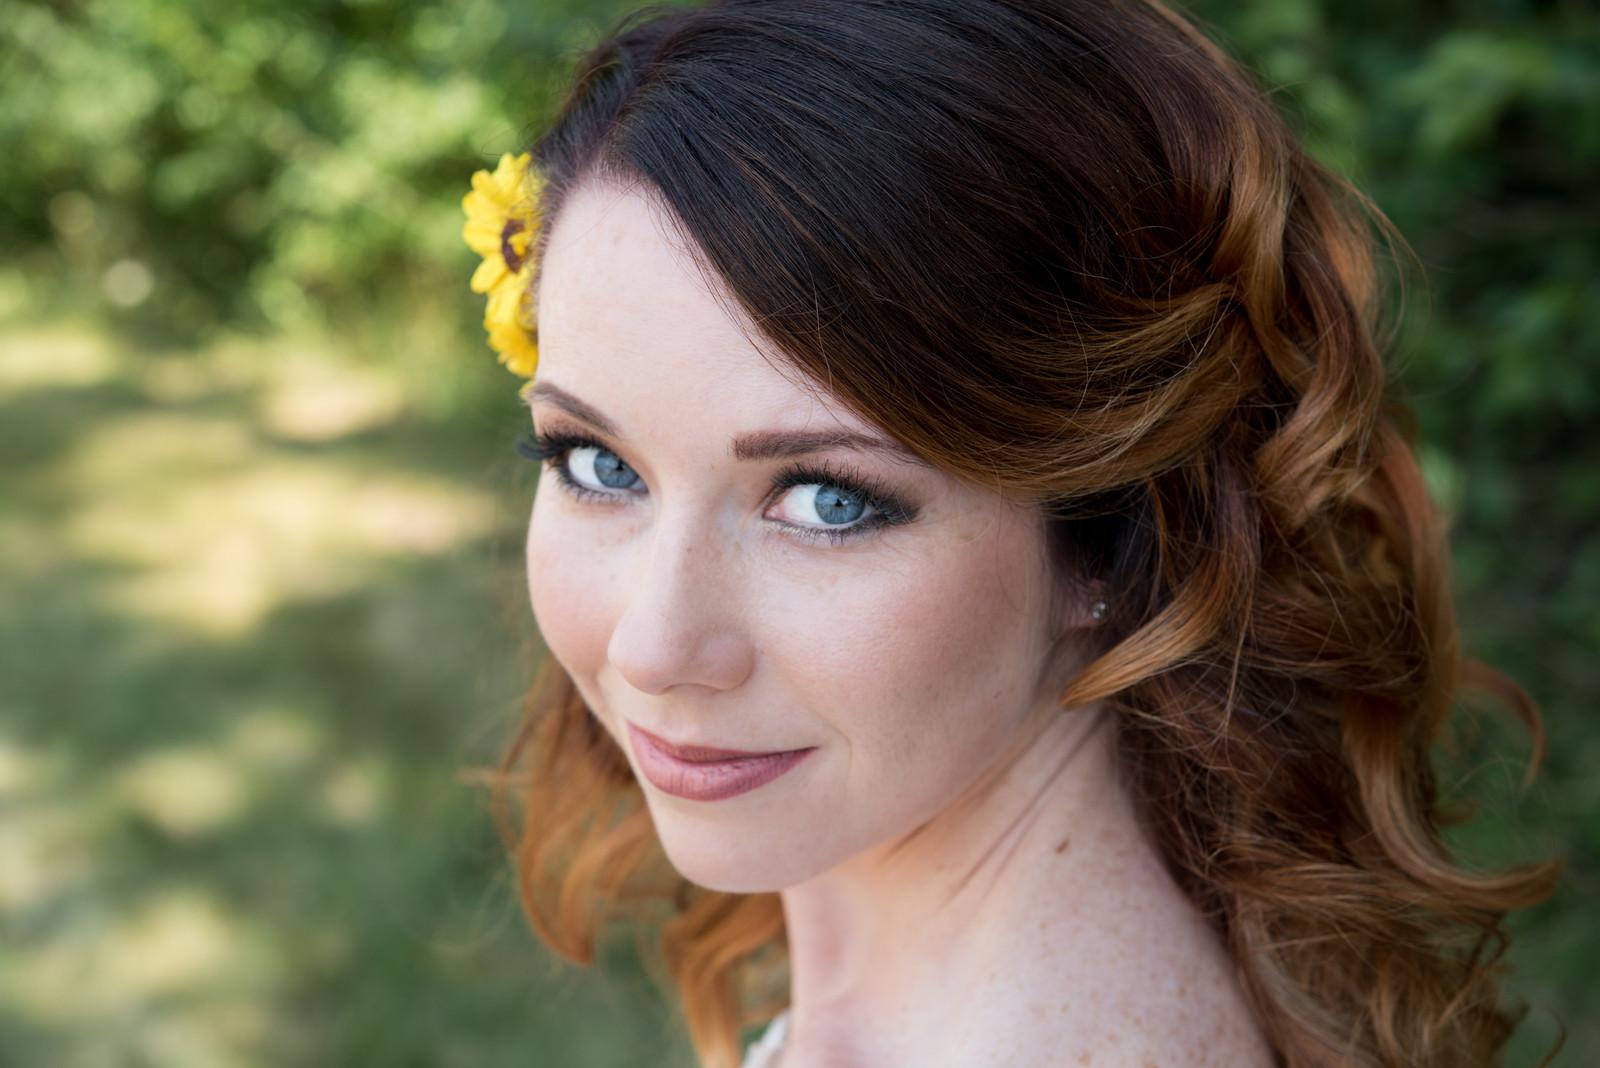 REFEYEANCE Makeup & Hair LLC- Award Winning Makeup Artists & Bridal Hair Stylists.